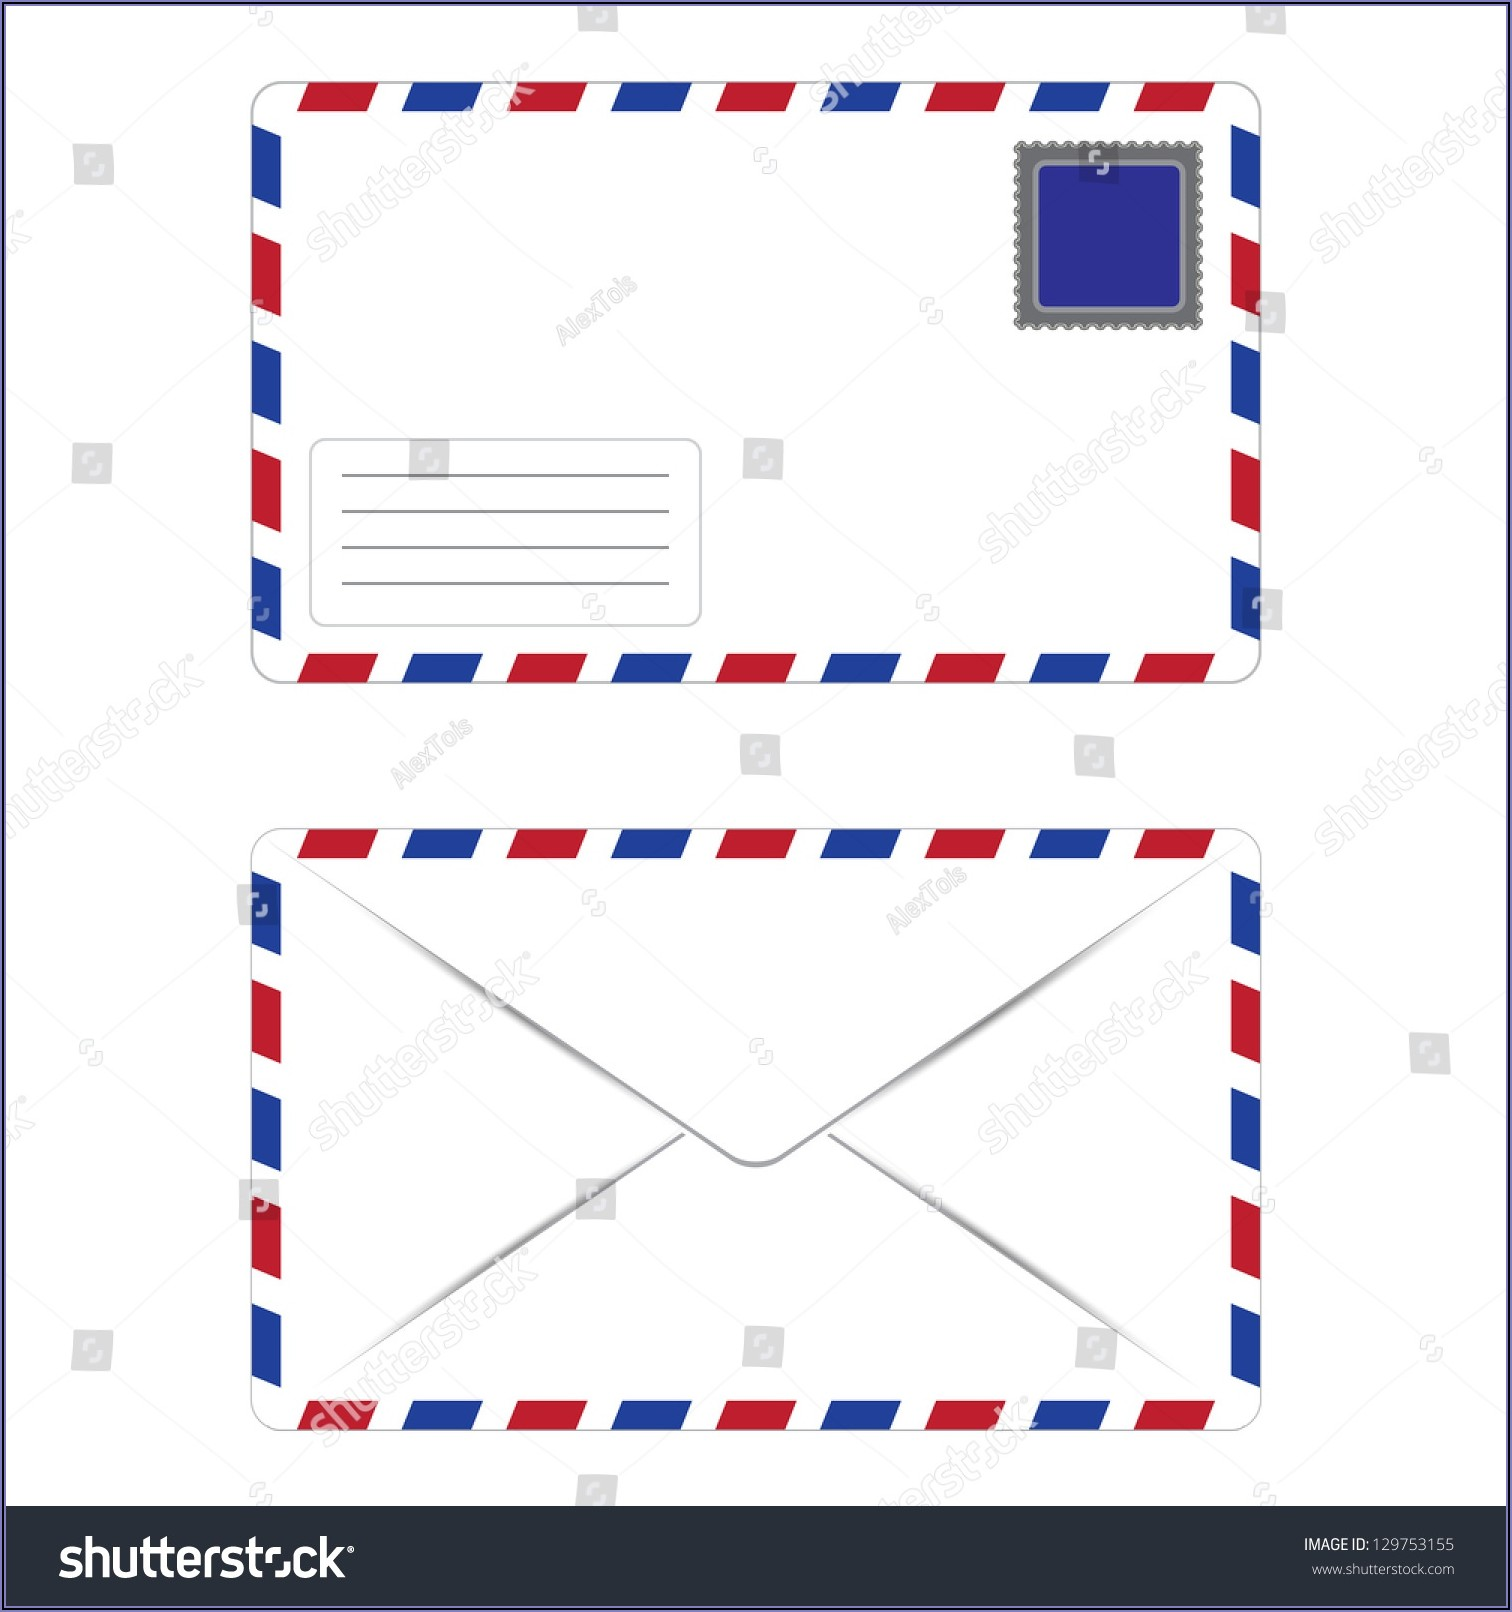 Postage For 5x7 Envelope 2020